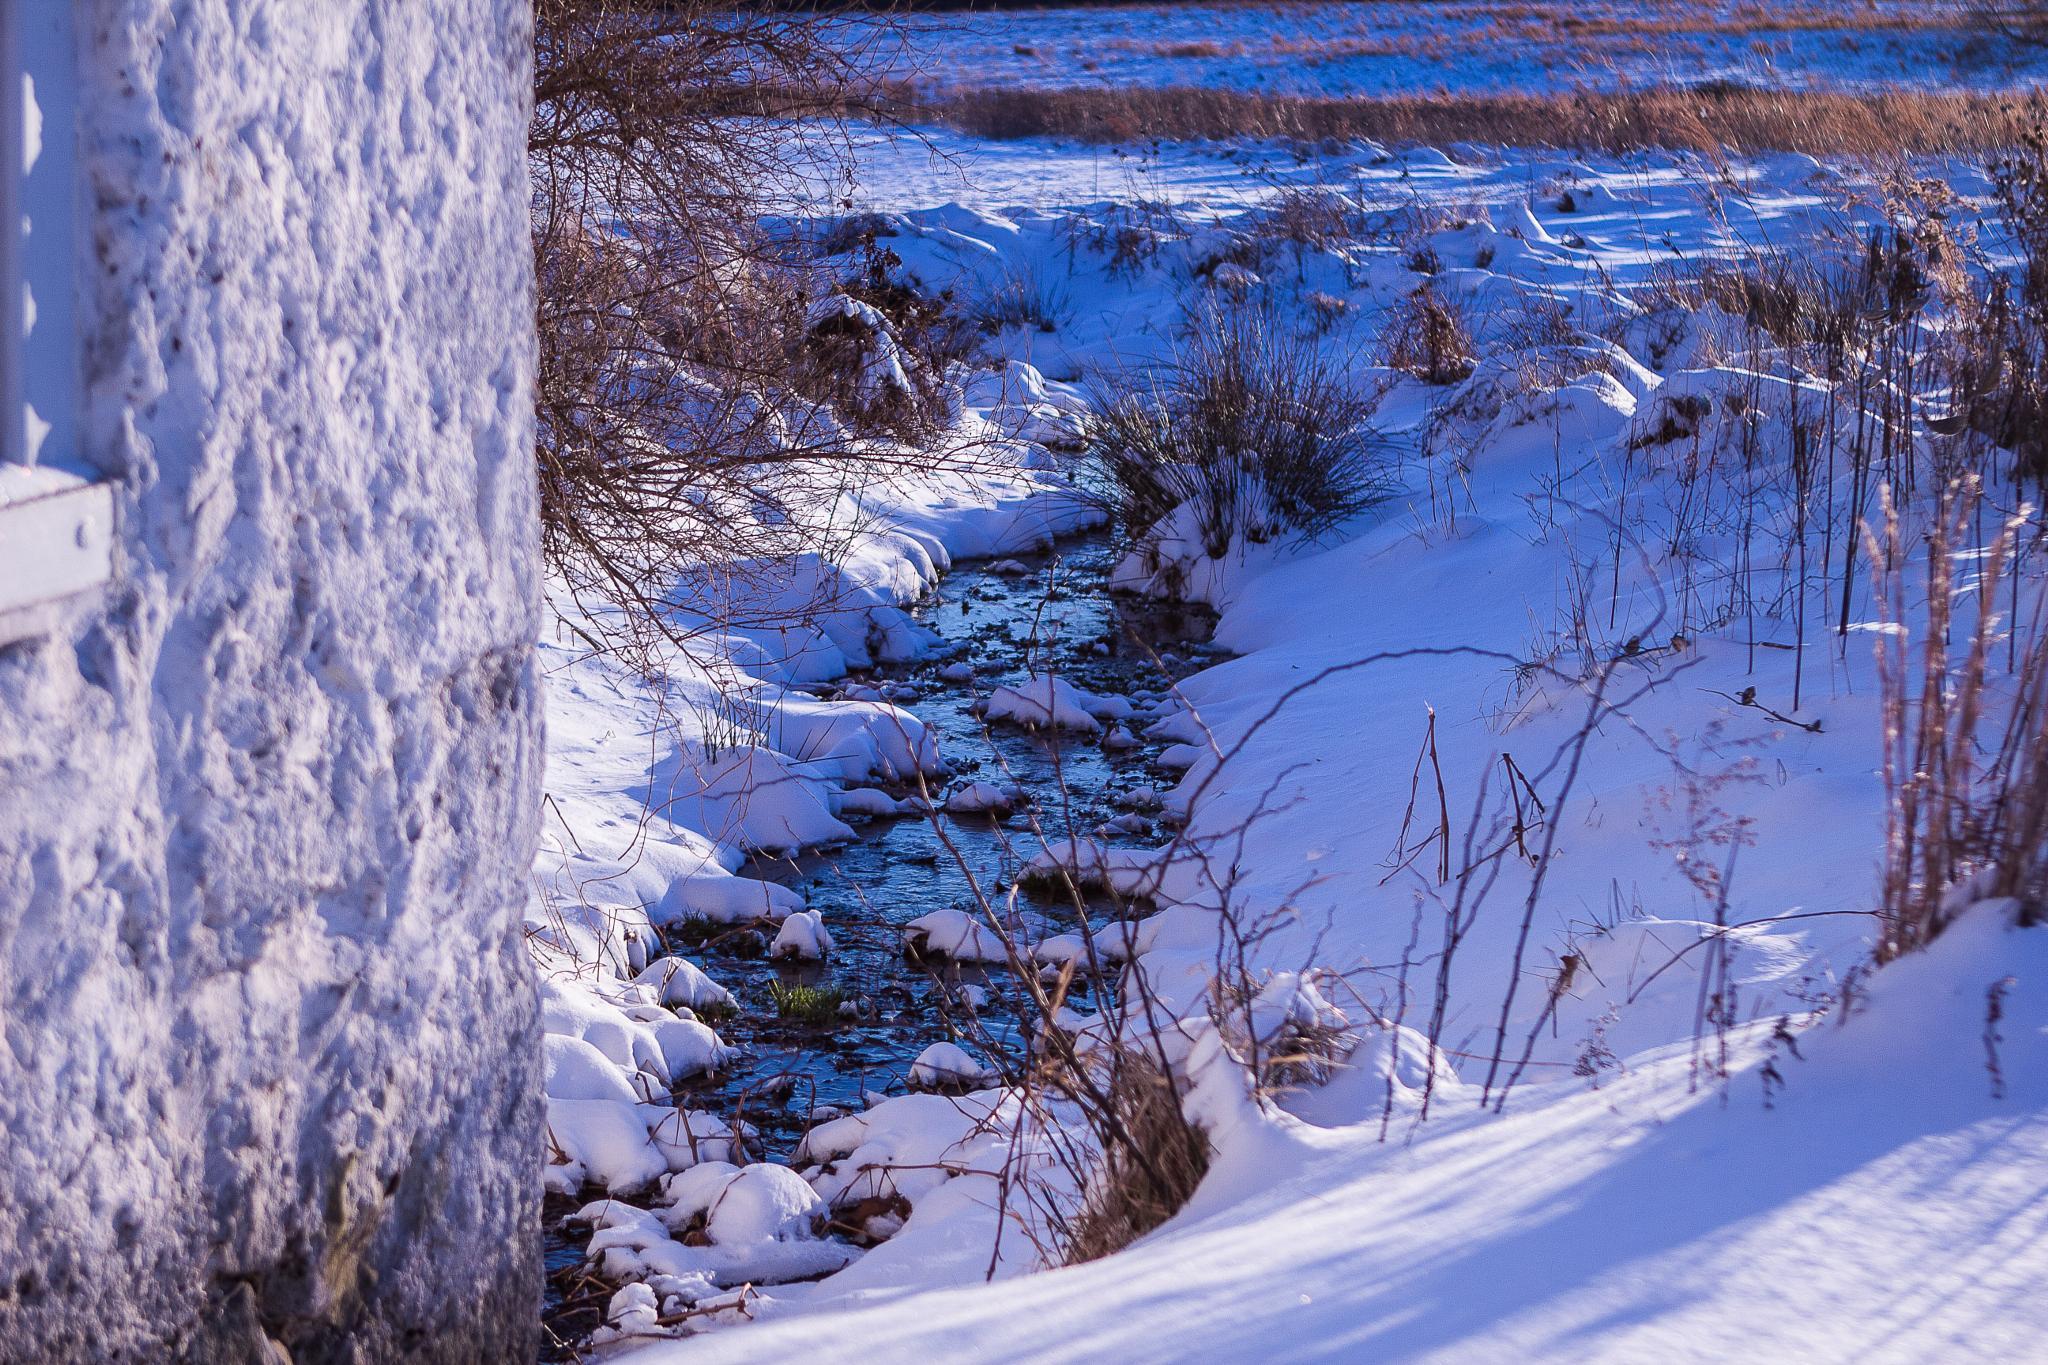 Winter Stream by Don F